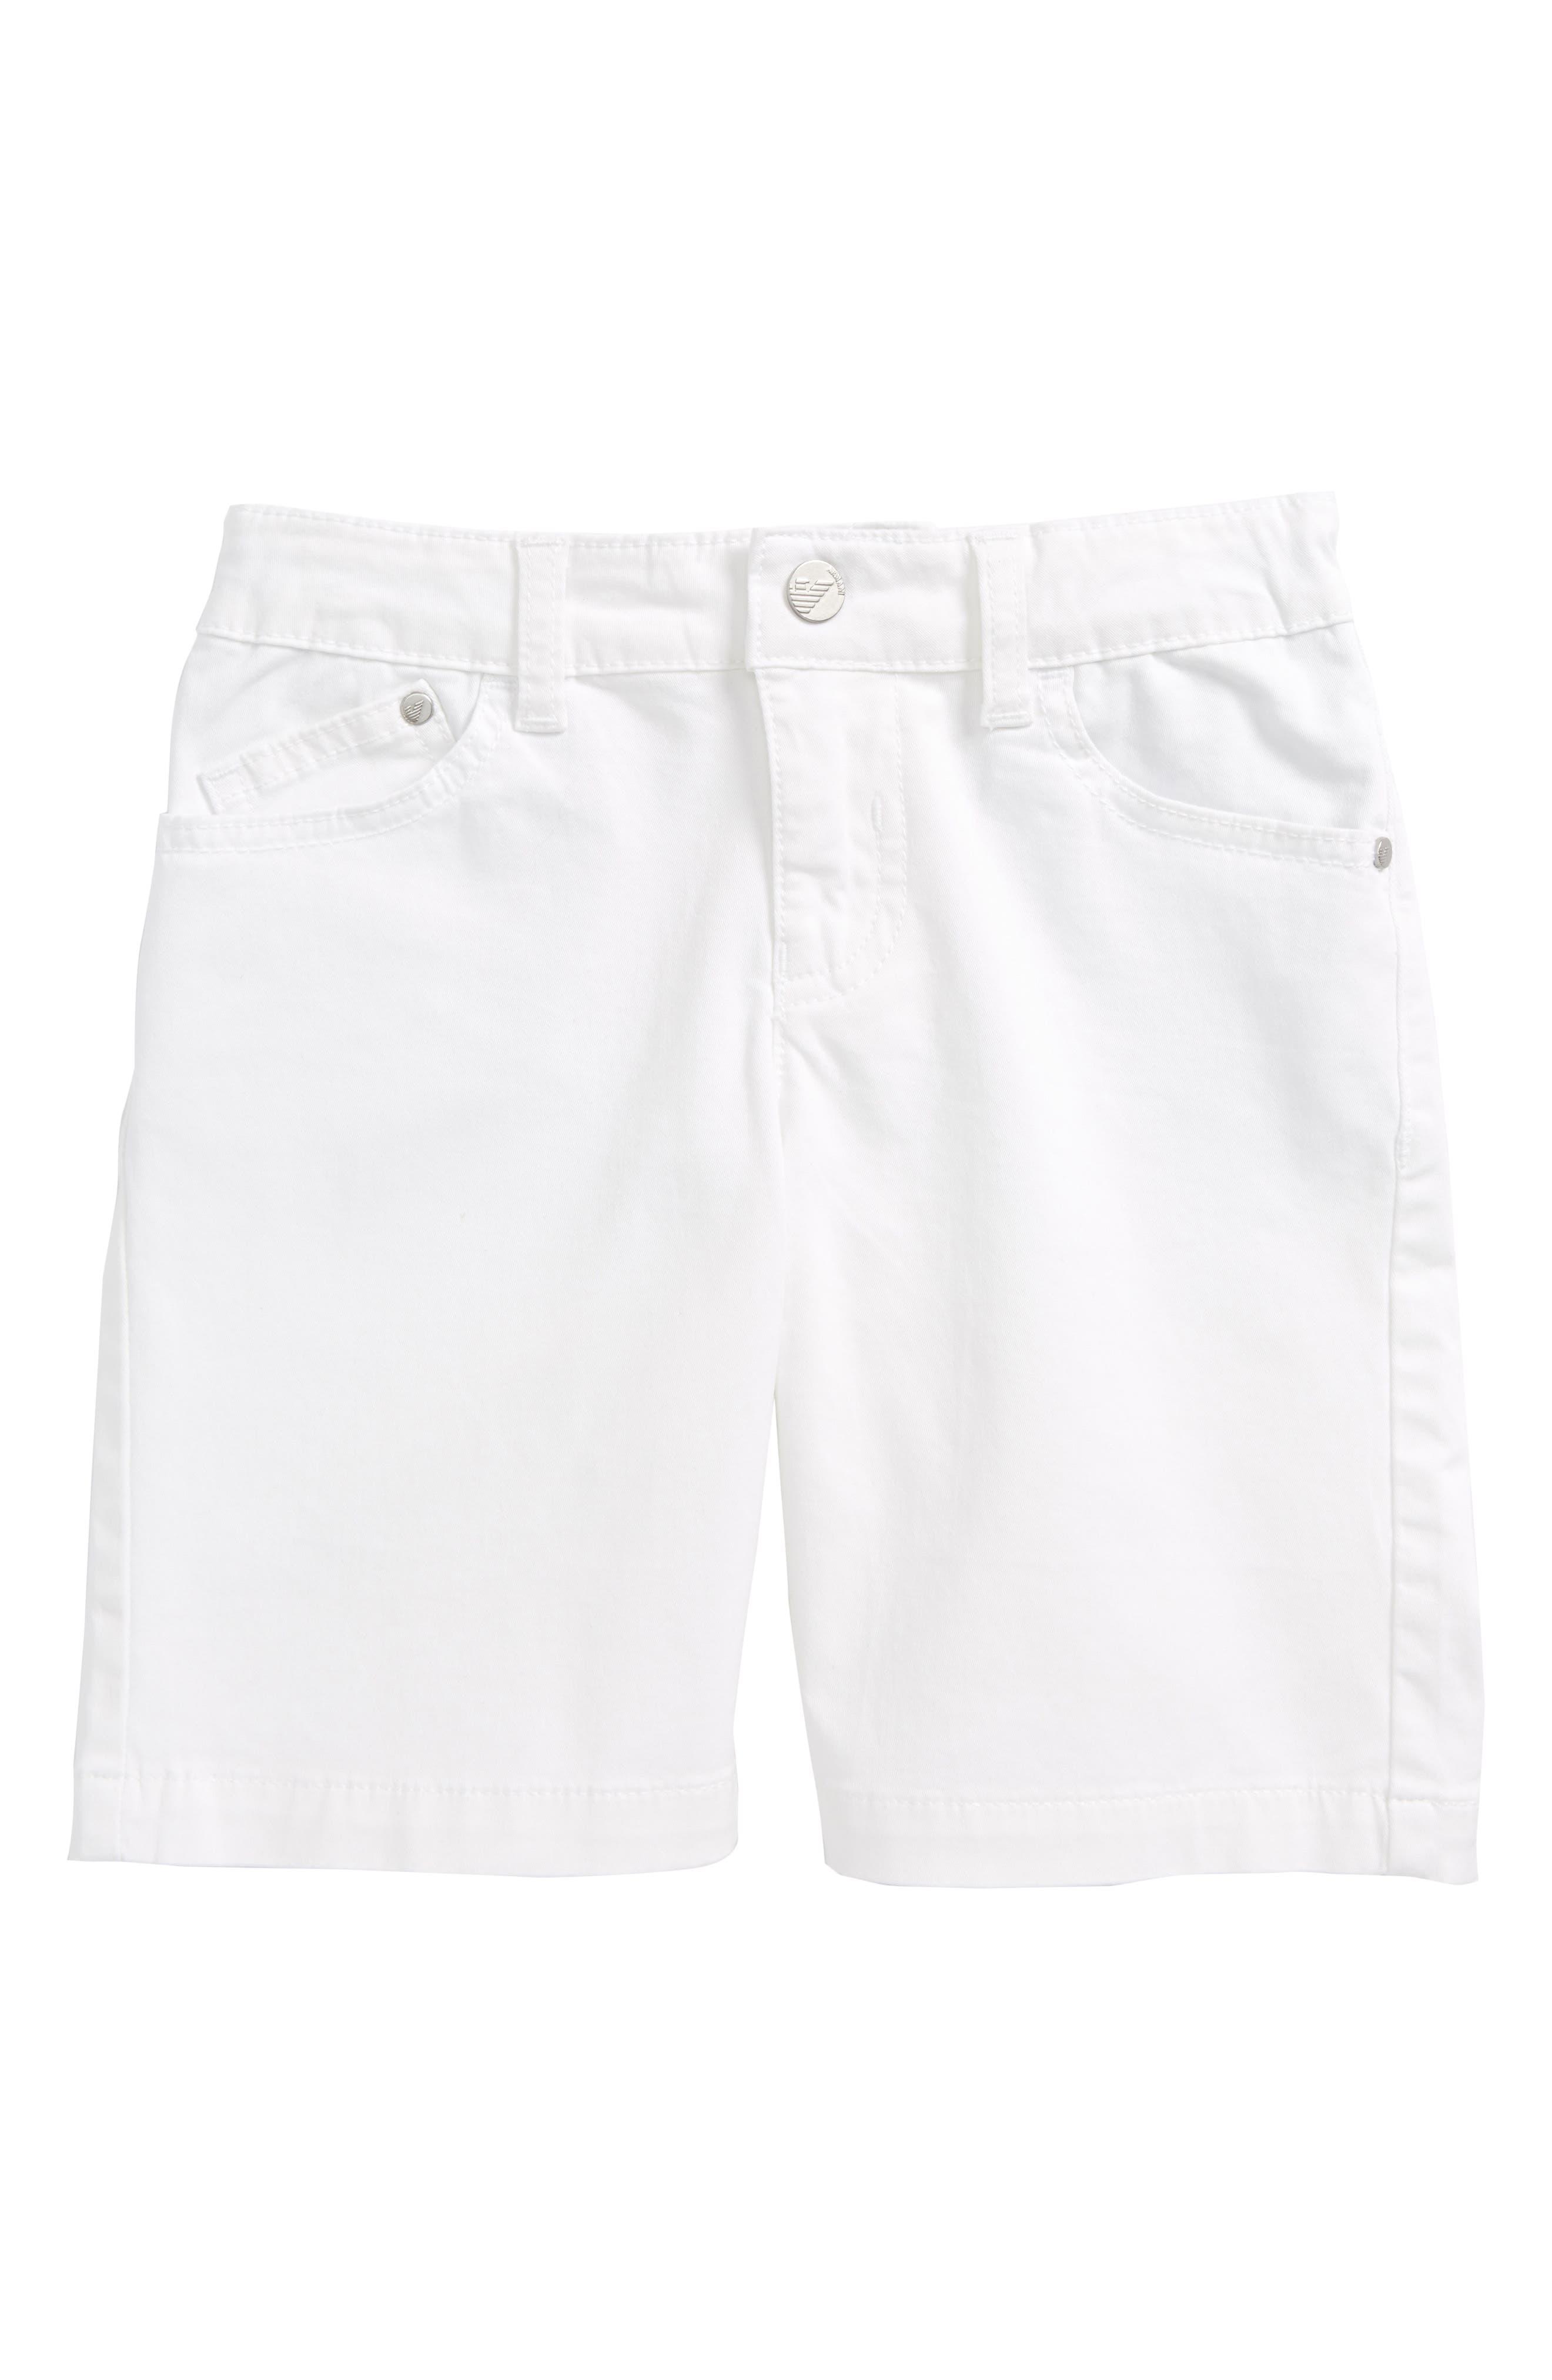 Stretch Cotton Shorts,                             Main thumbnail 1, color,                             100